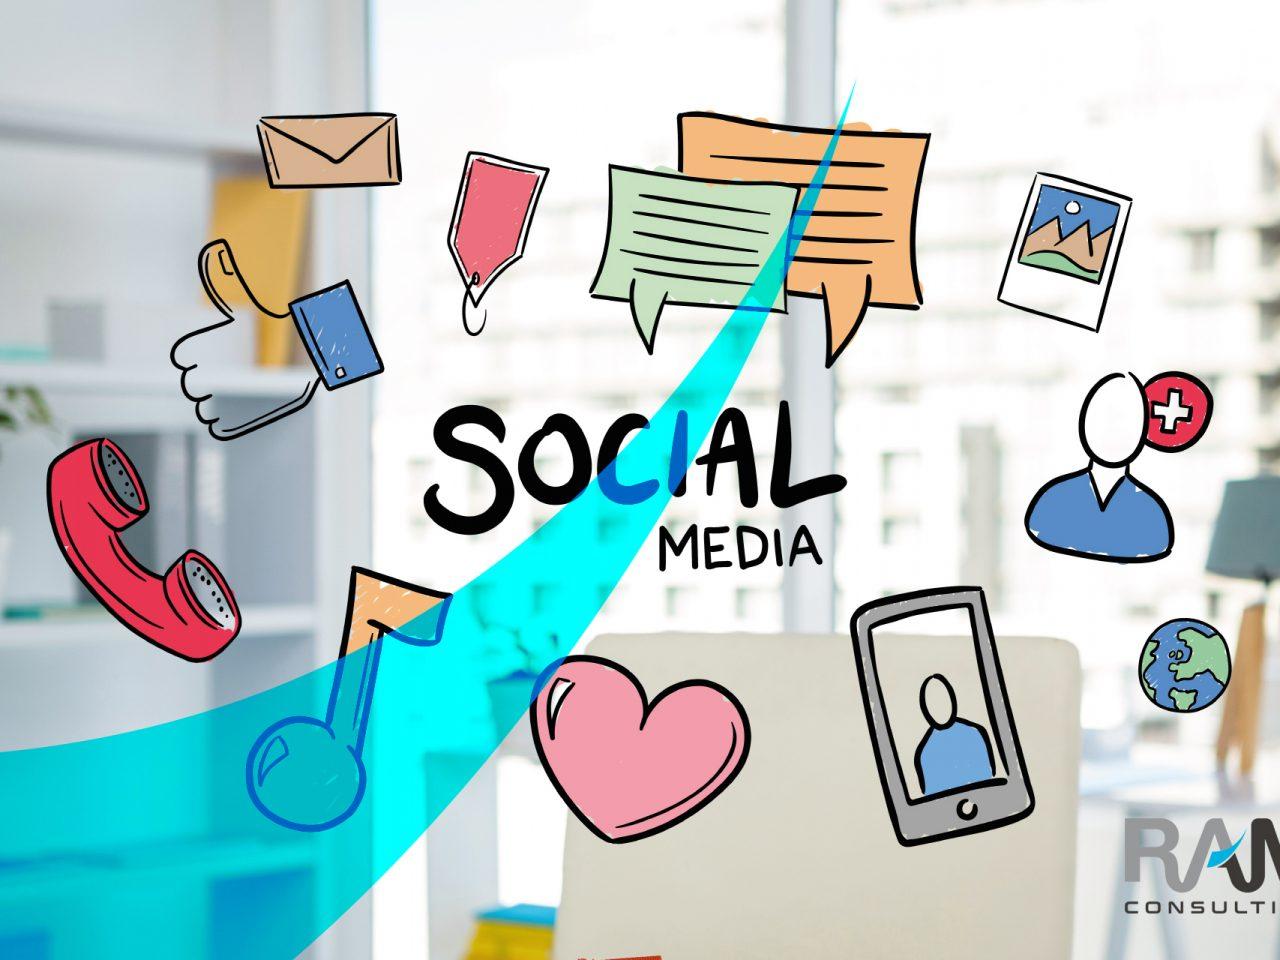 https://ram-consulting.org/wp-content/uploads/2021/01/social-media-1280x960.jpg